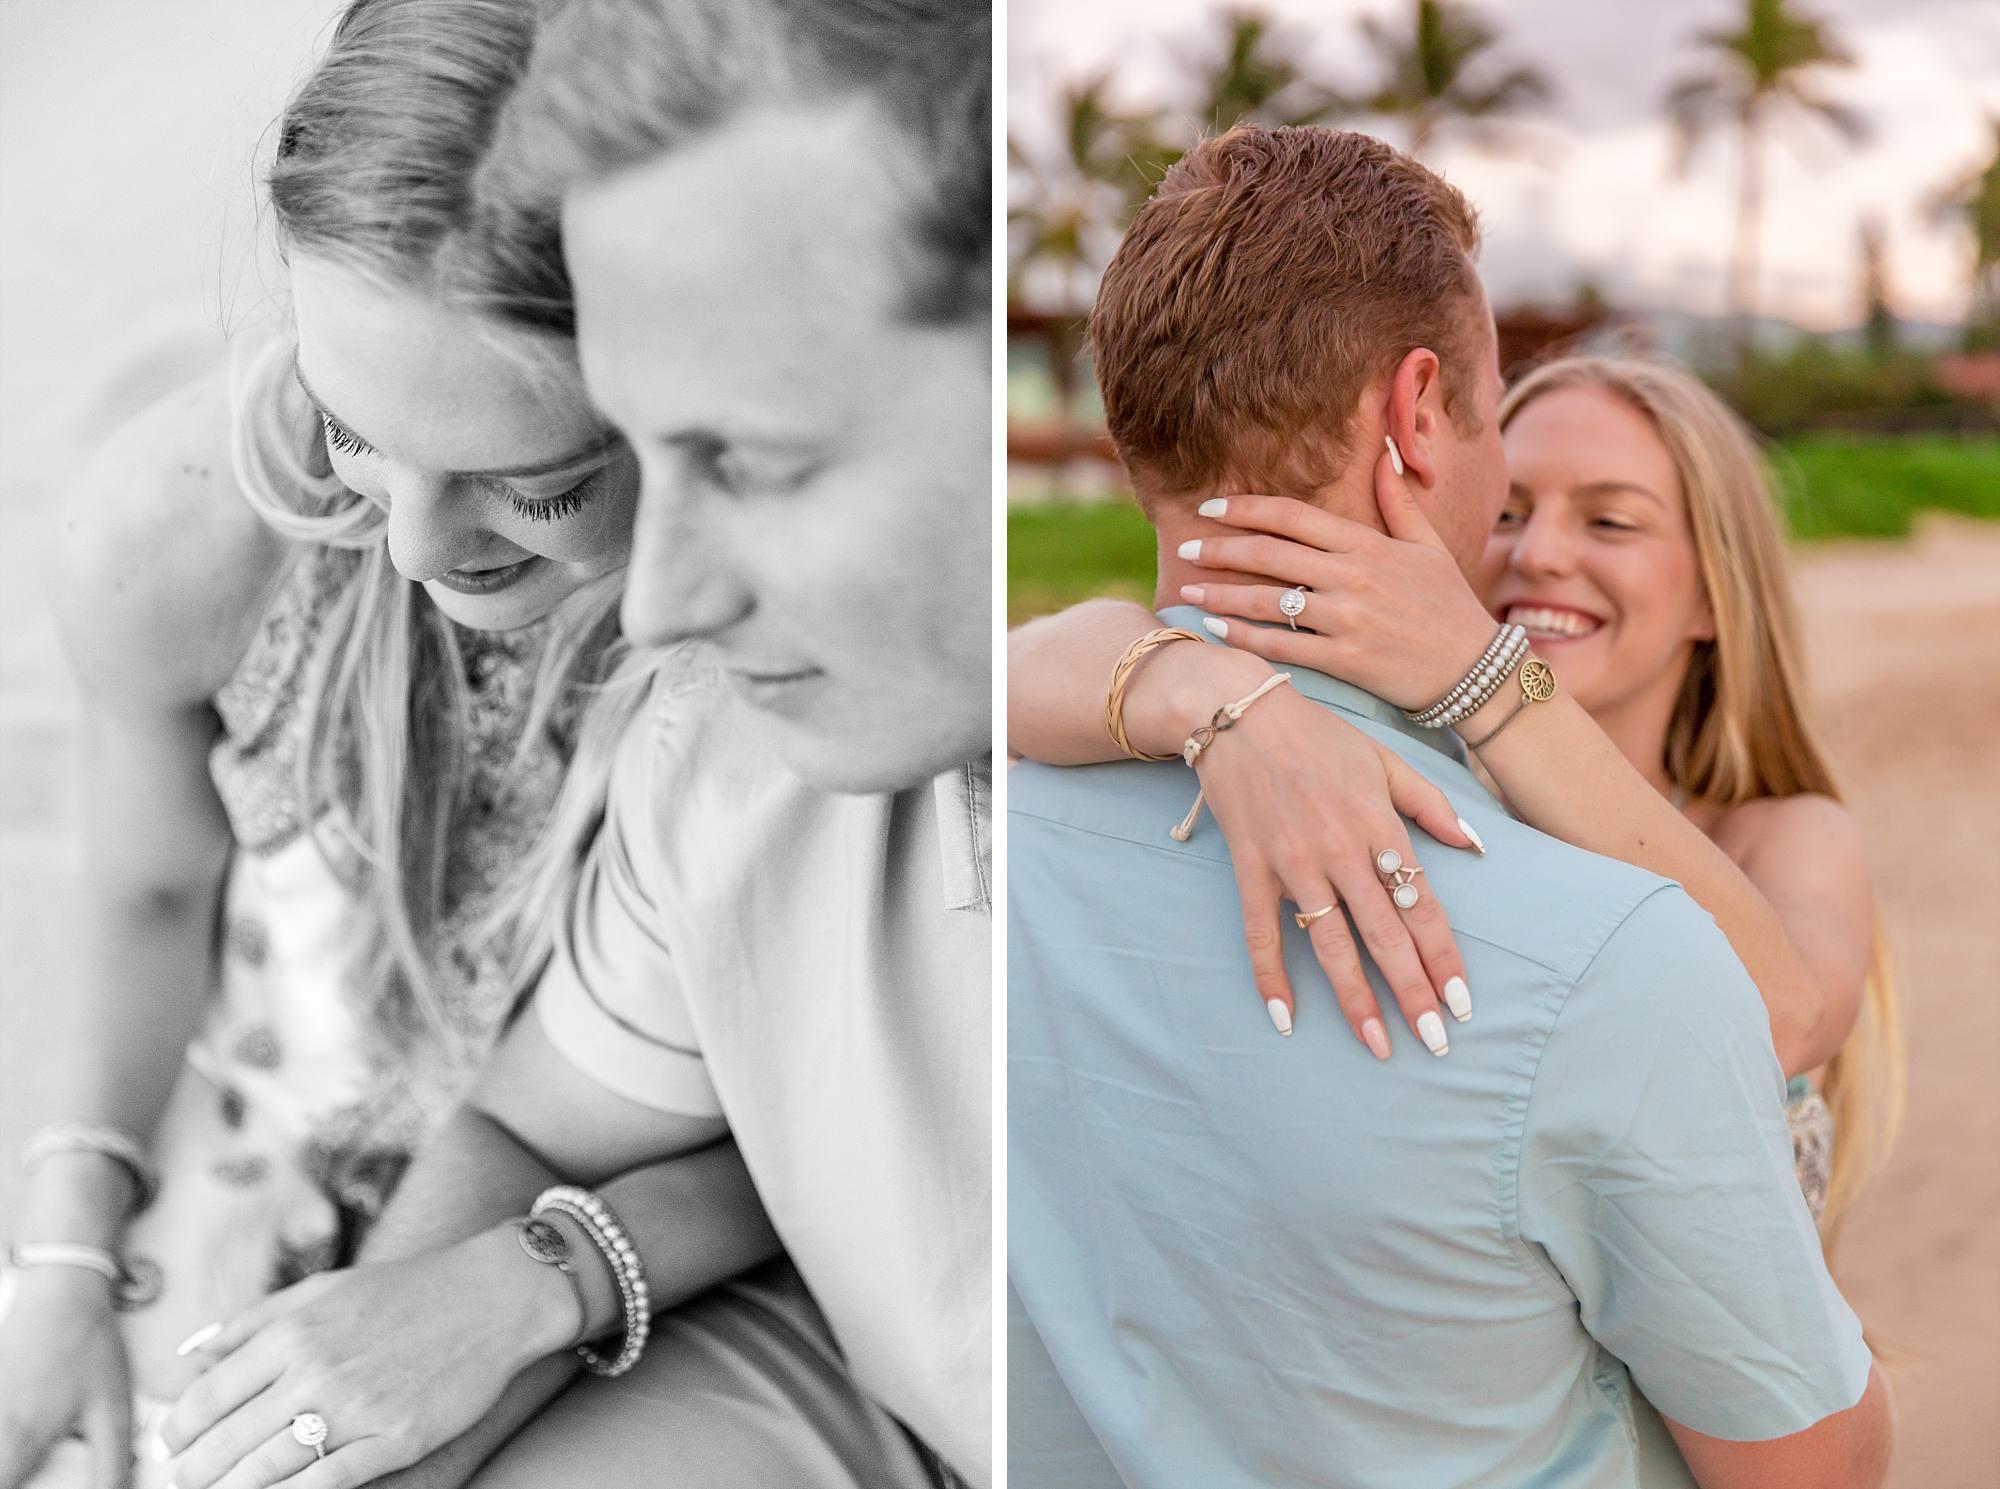 engagement photos, fiances hugging and cuddling close